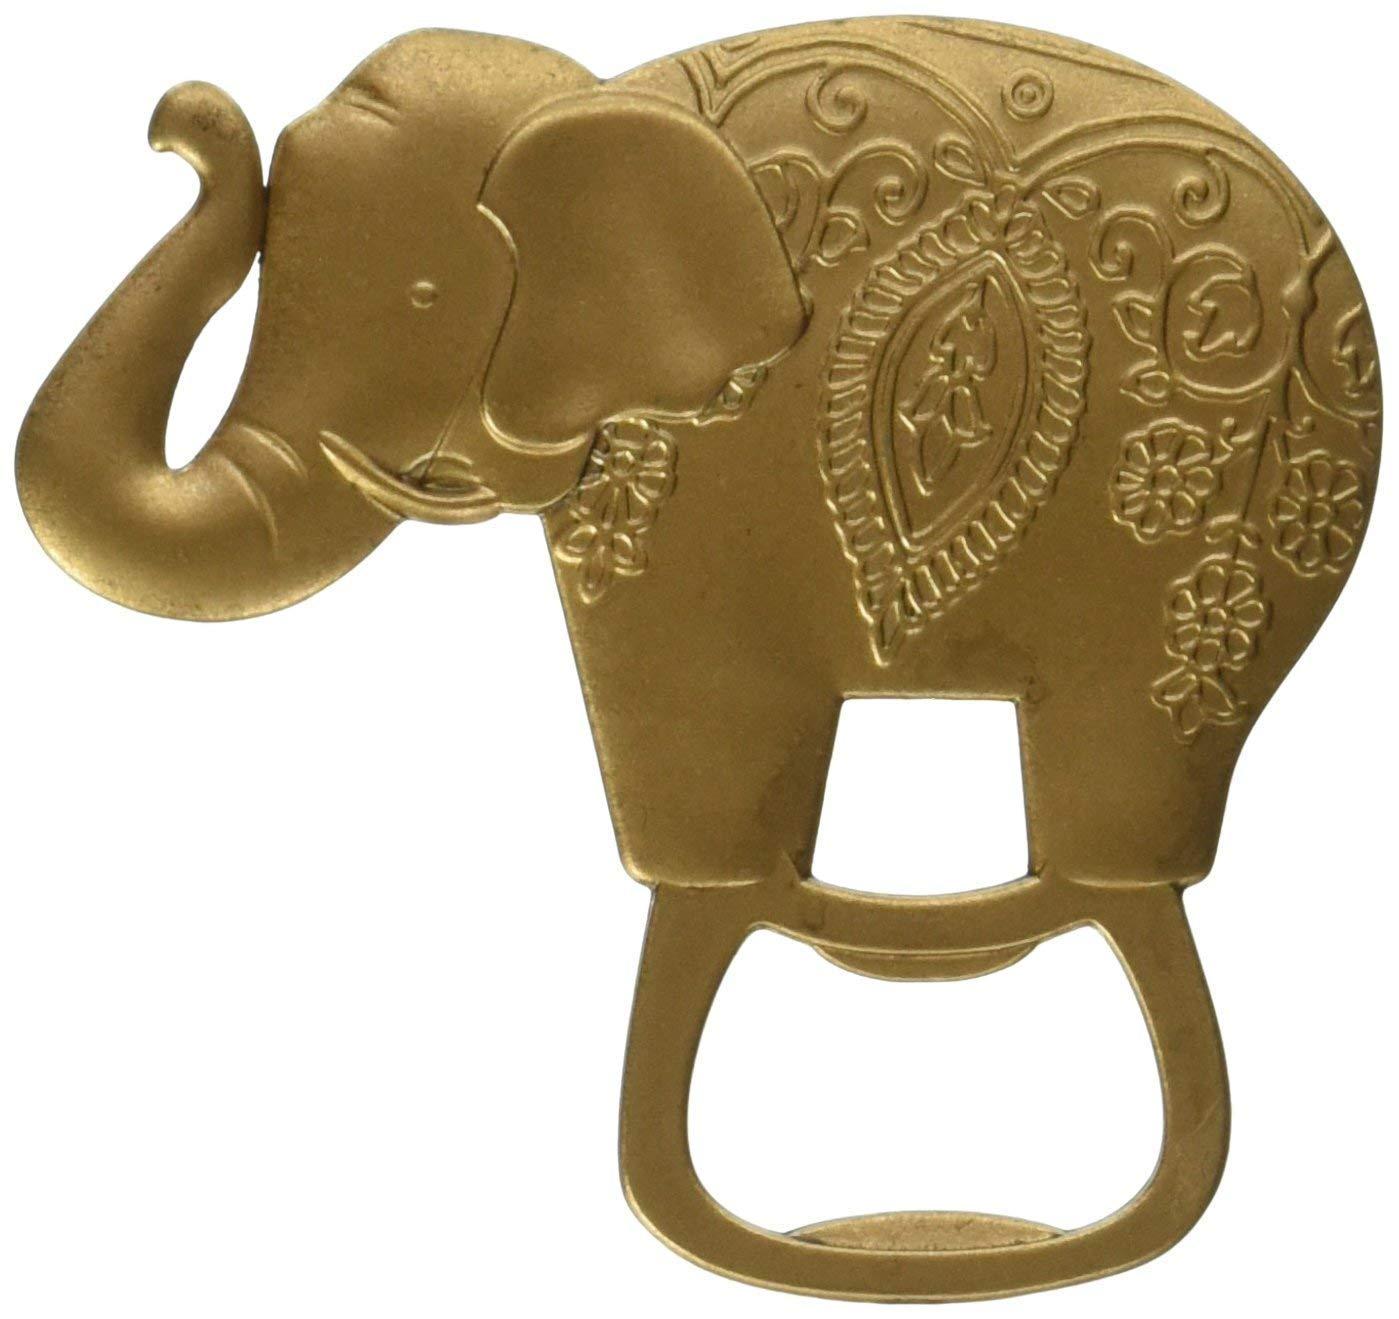 60 Kate Aspen Antique Gold Finish Metal Lucky Golden Elephant Shaped Bottle Cap Opener Wedding Thank-you Gifts Bridal Shower Party Souvenir Favors